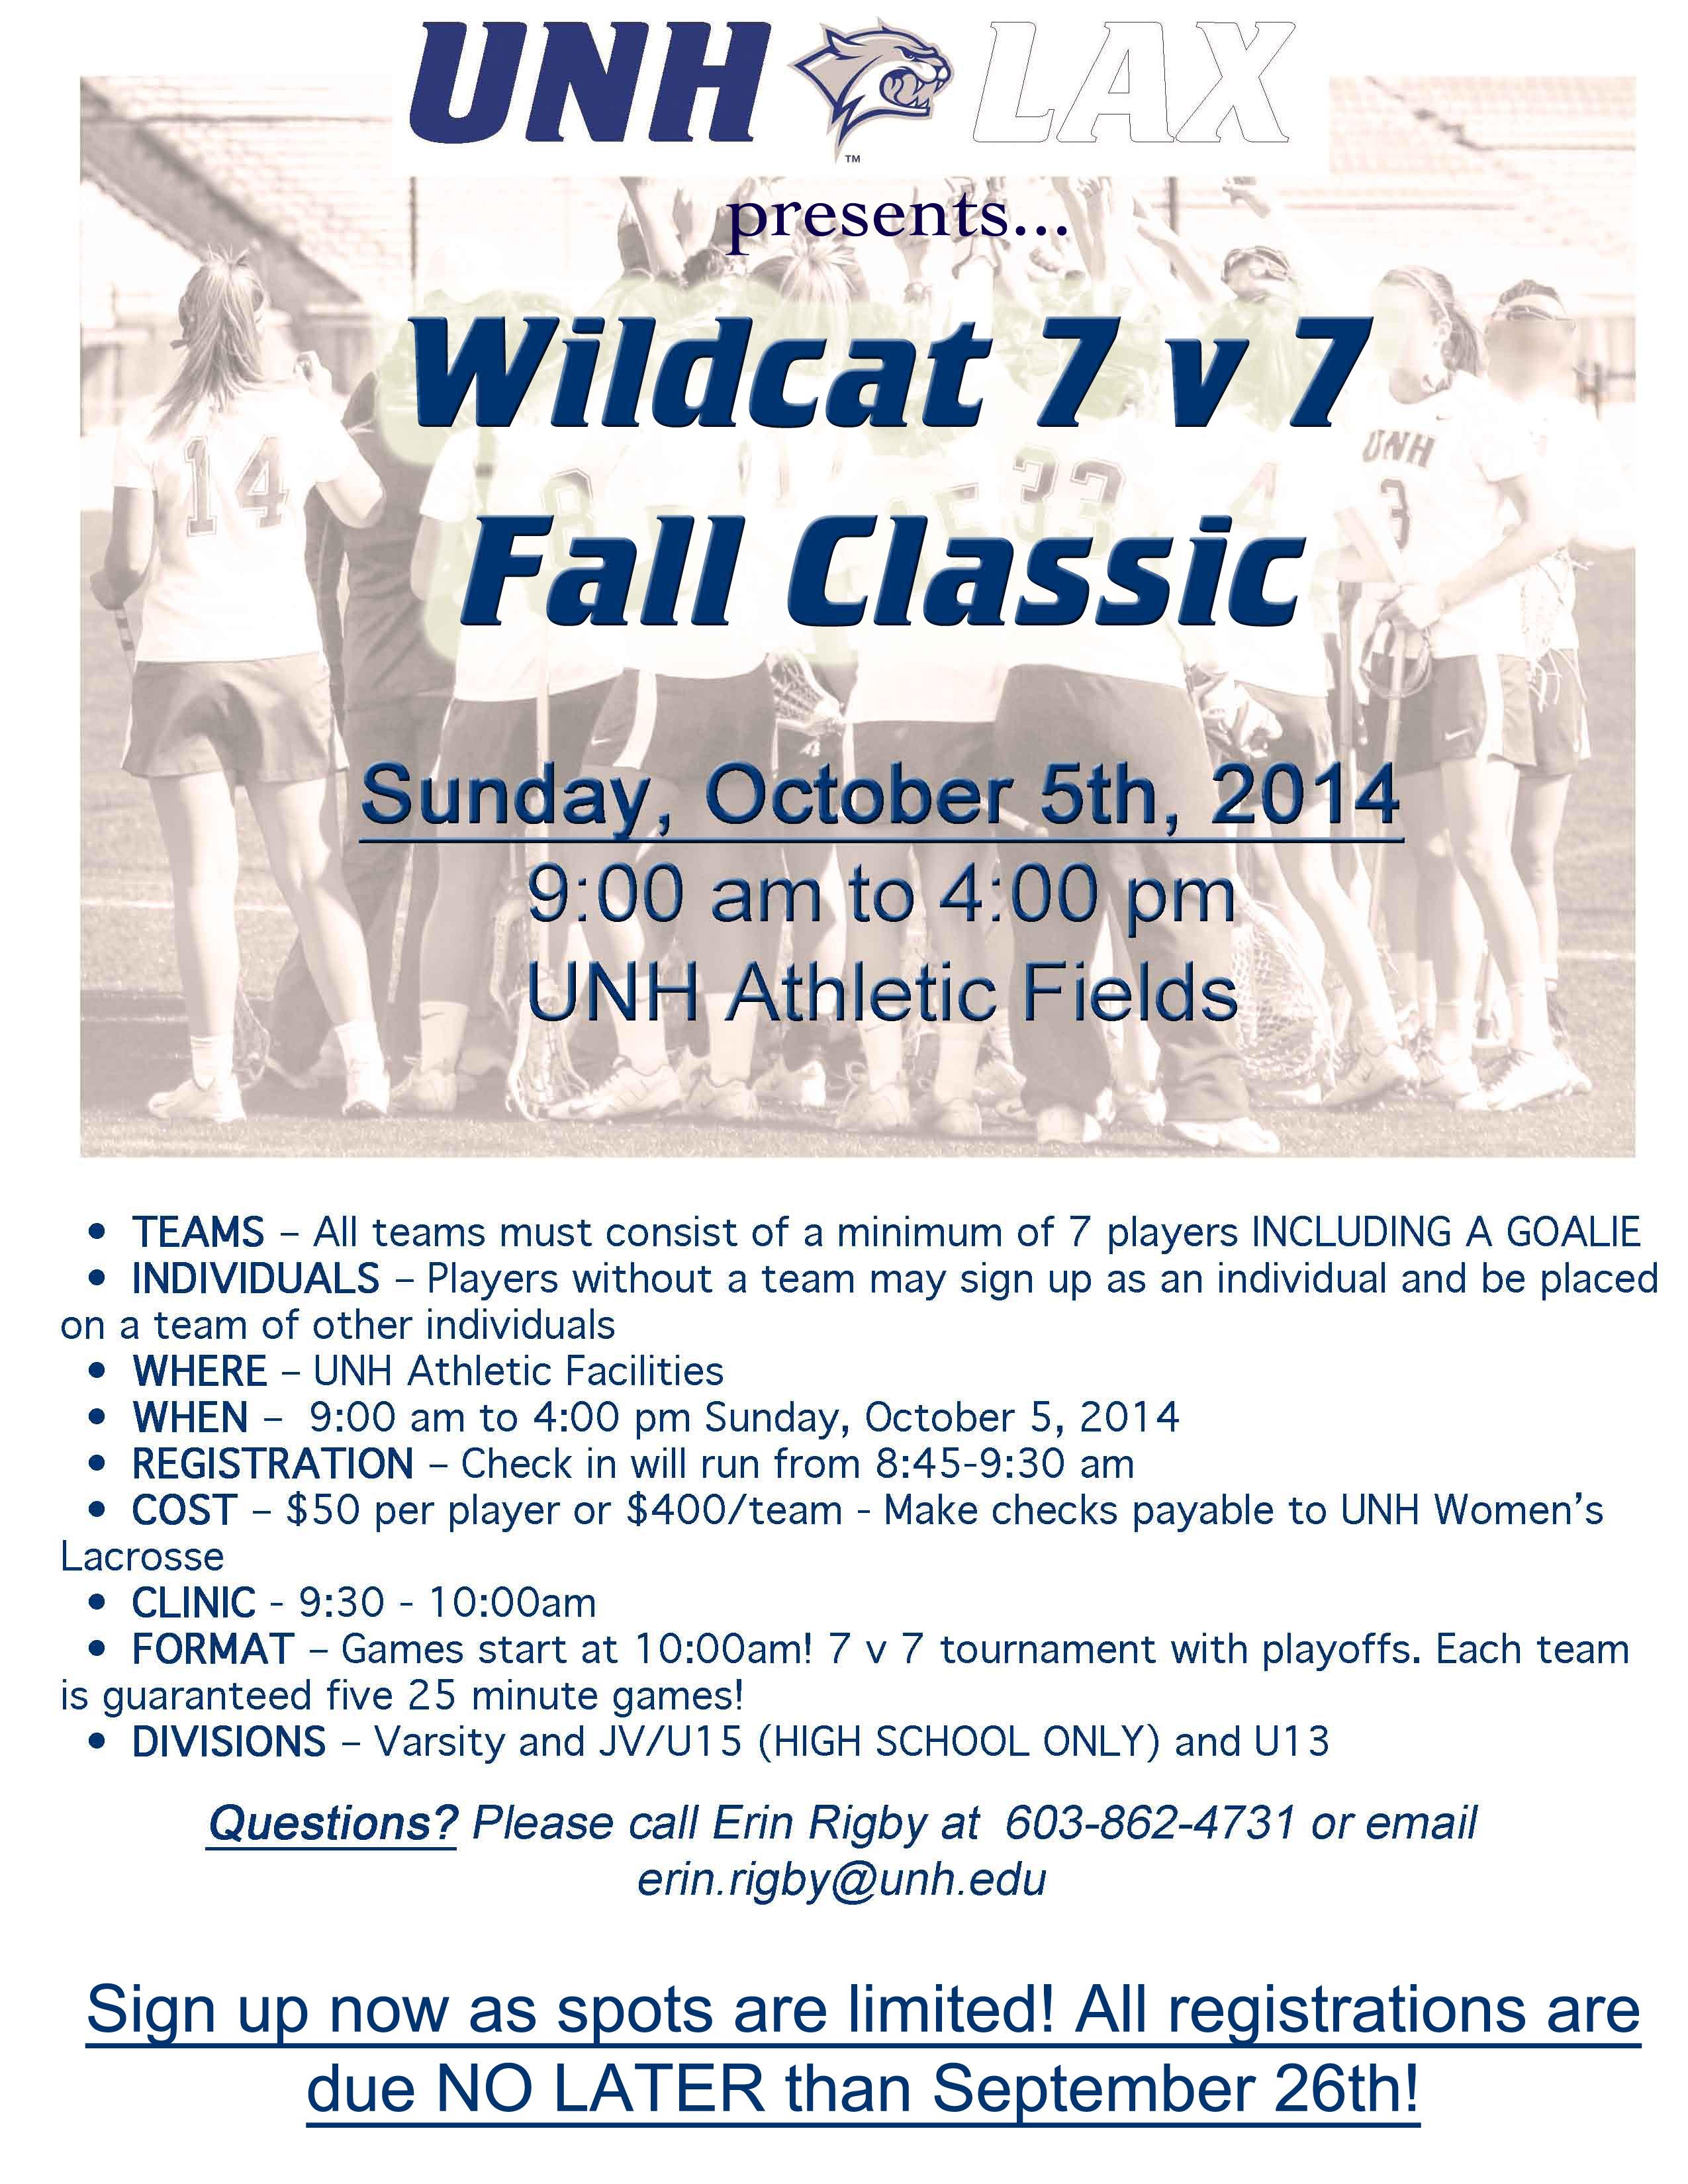 UNH Fall Classic 7 v 7 flyer